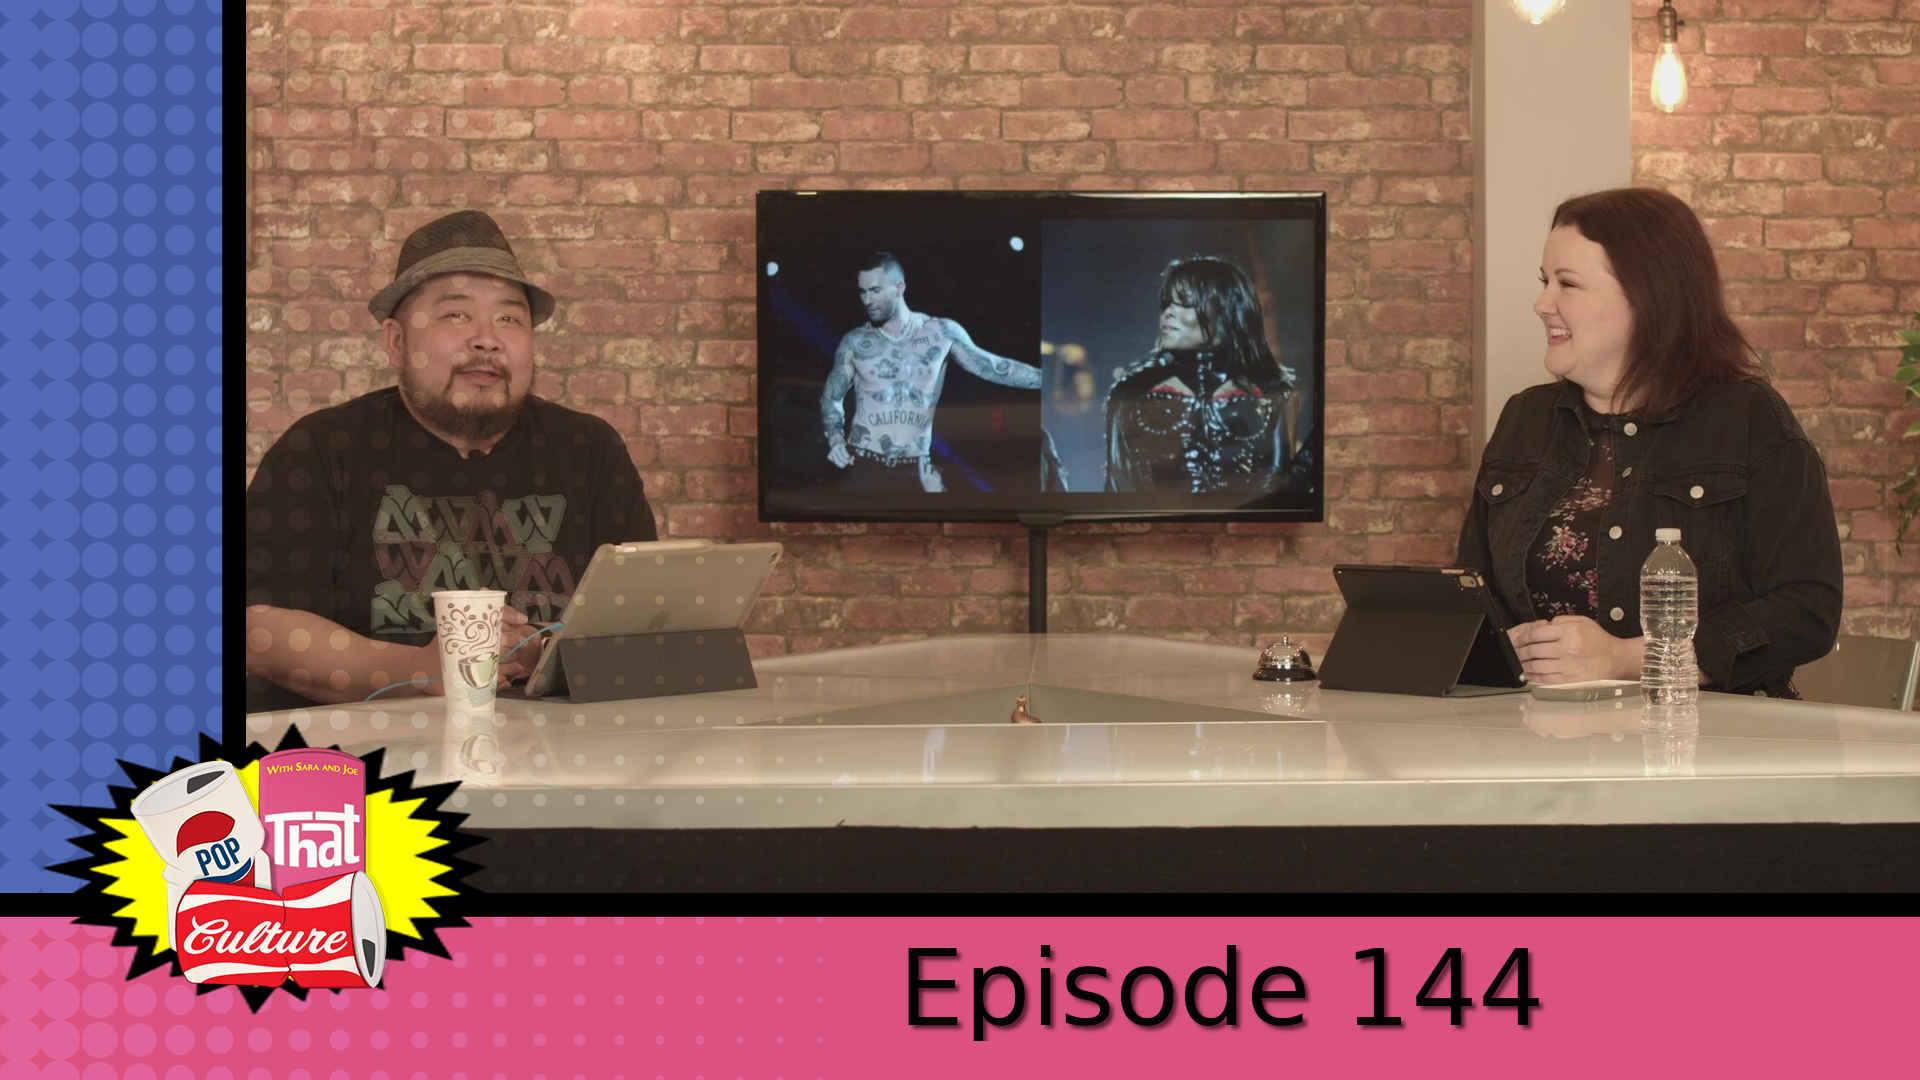 Pop That Culture - Episode 144